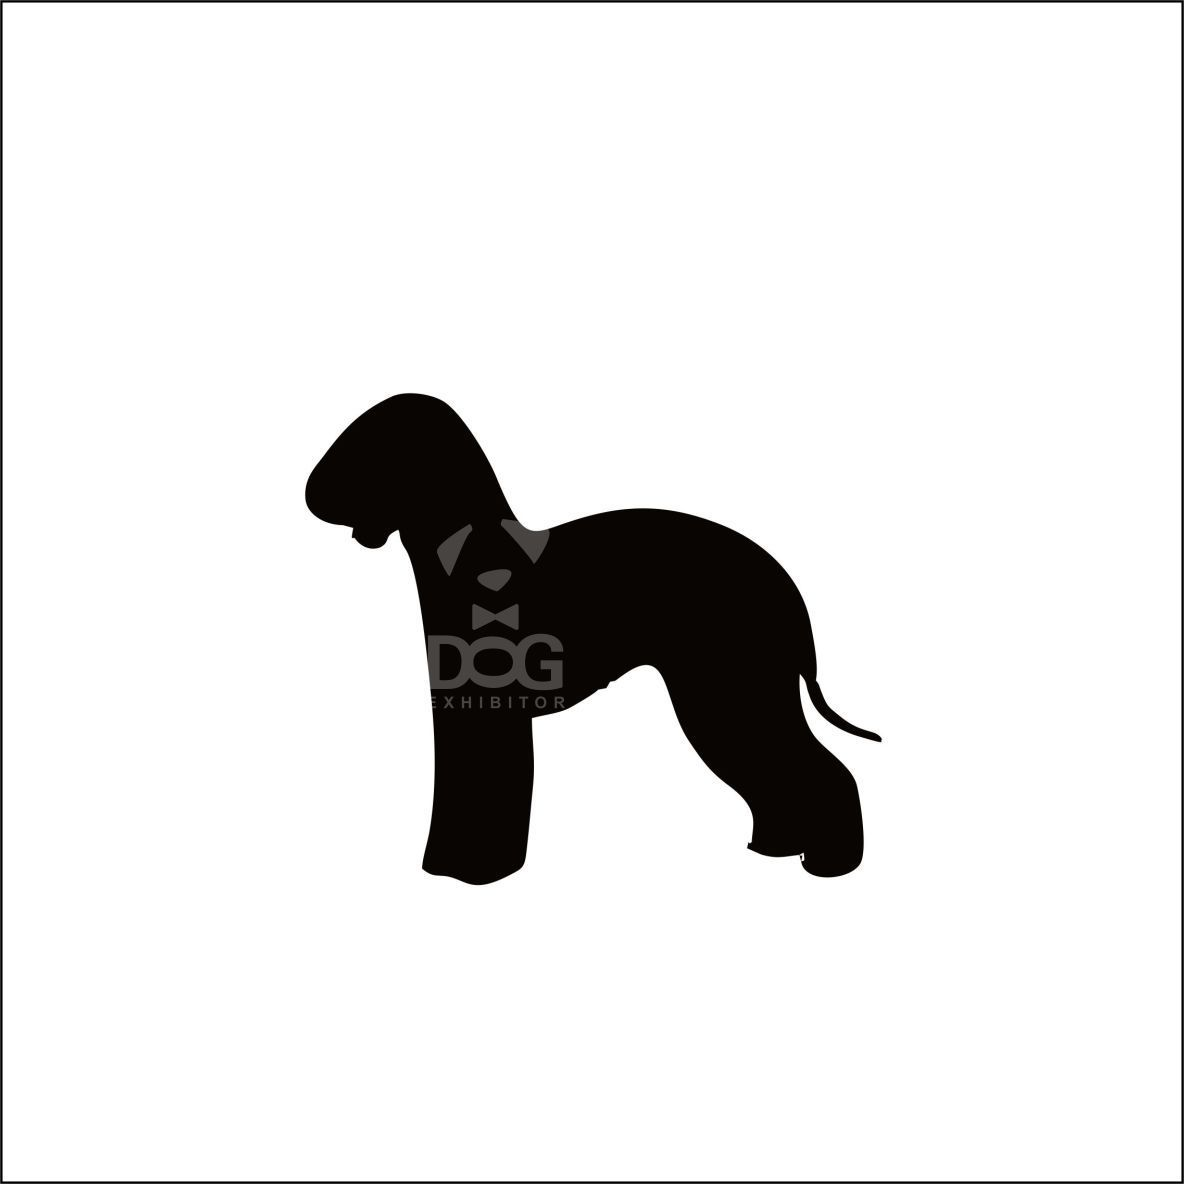 1184x1184 Bedlington Silhouette Stickers